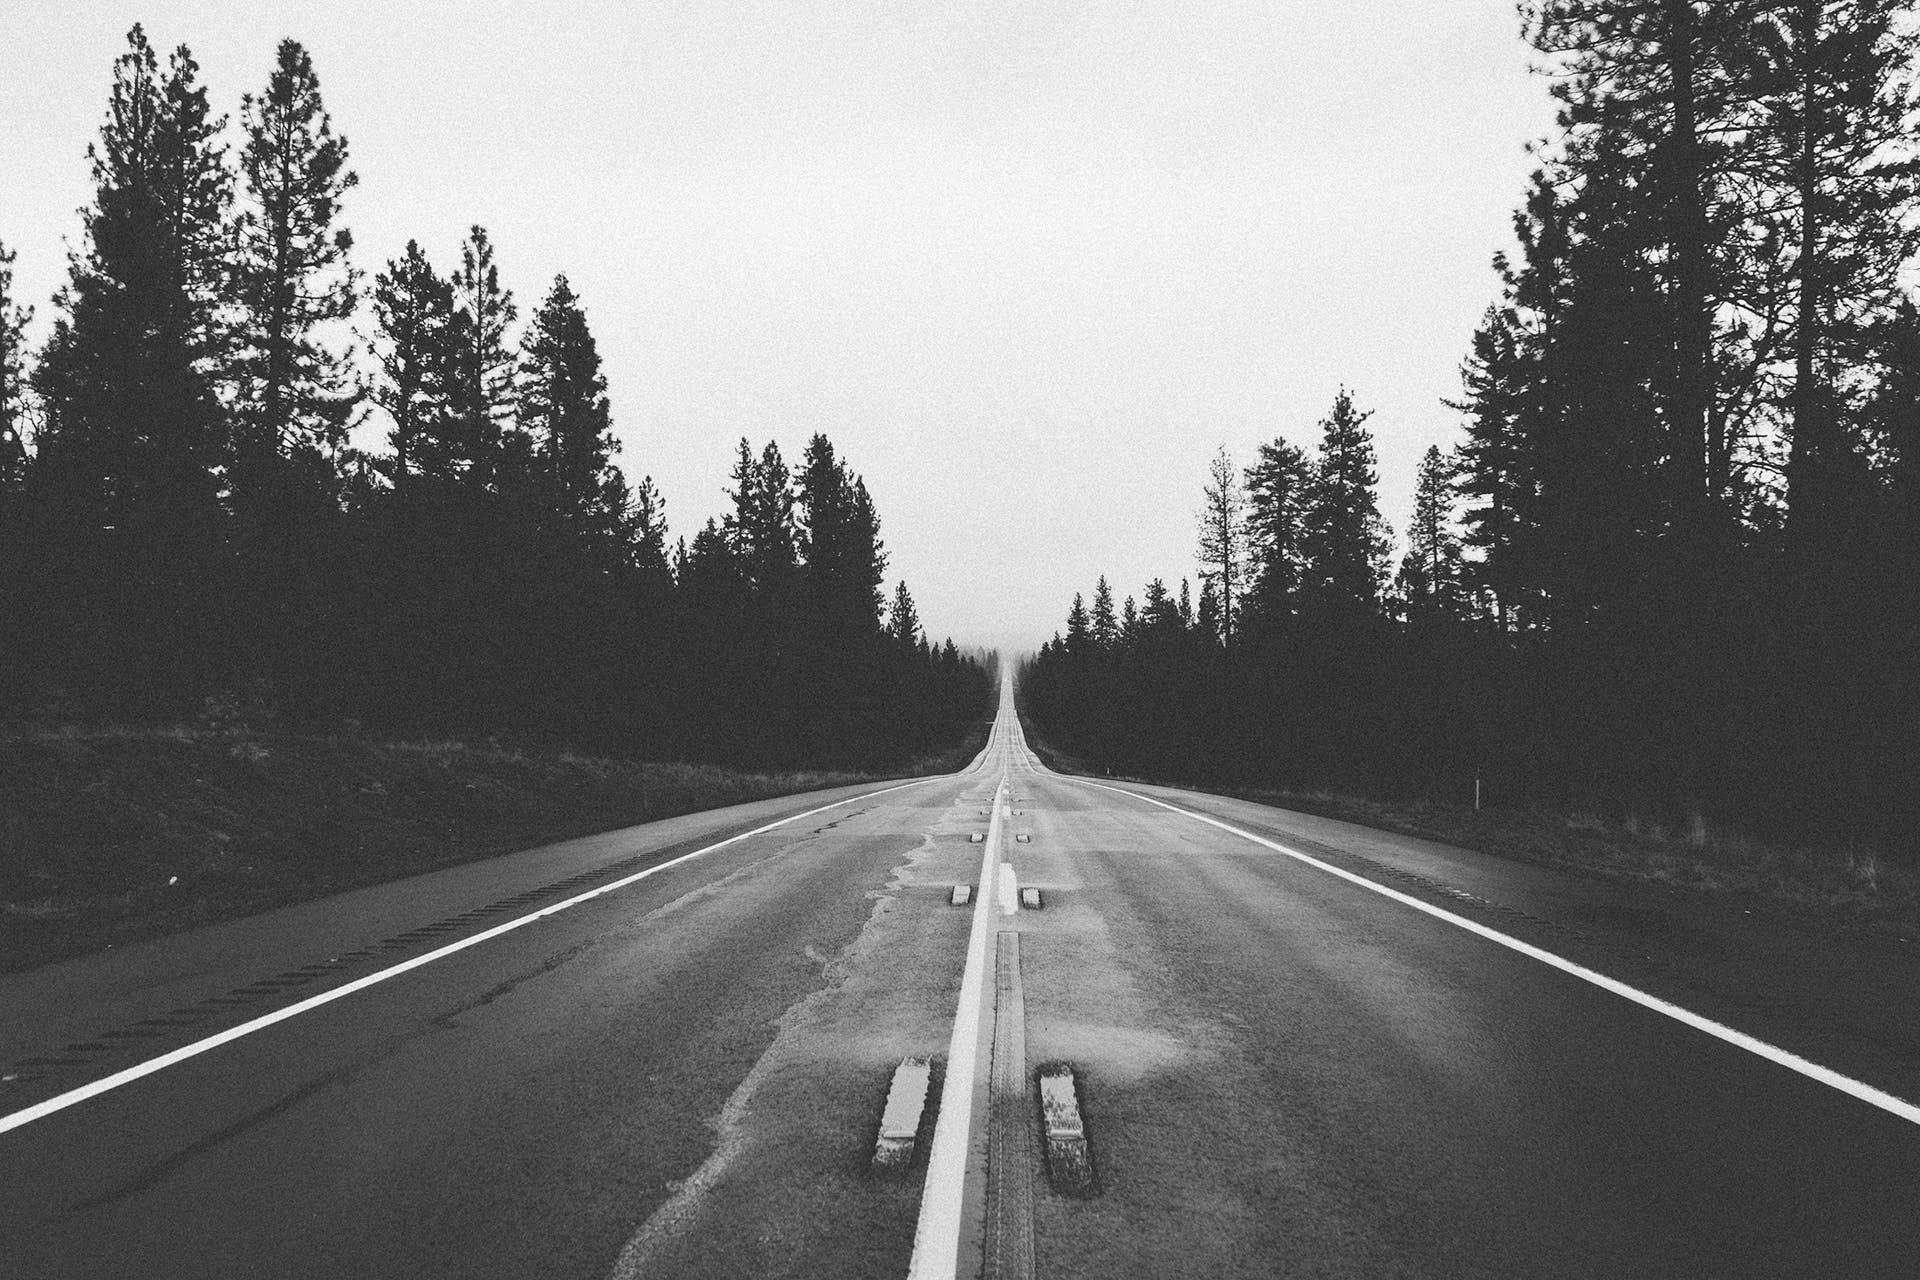 endless, long, road